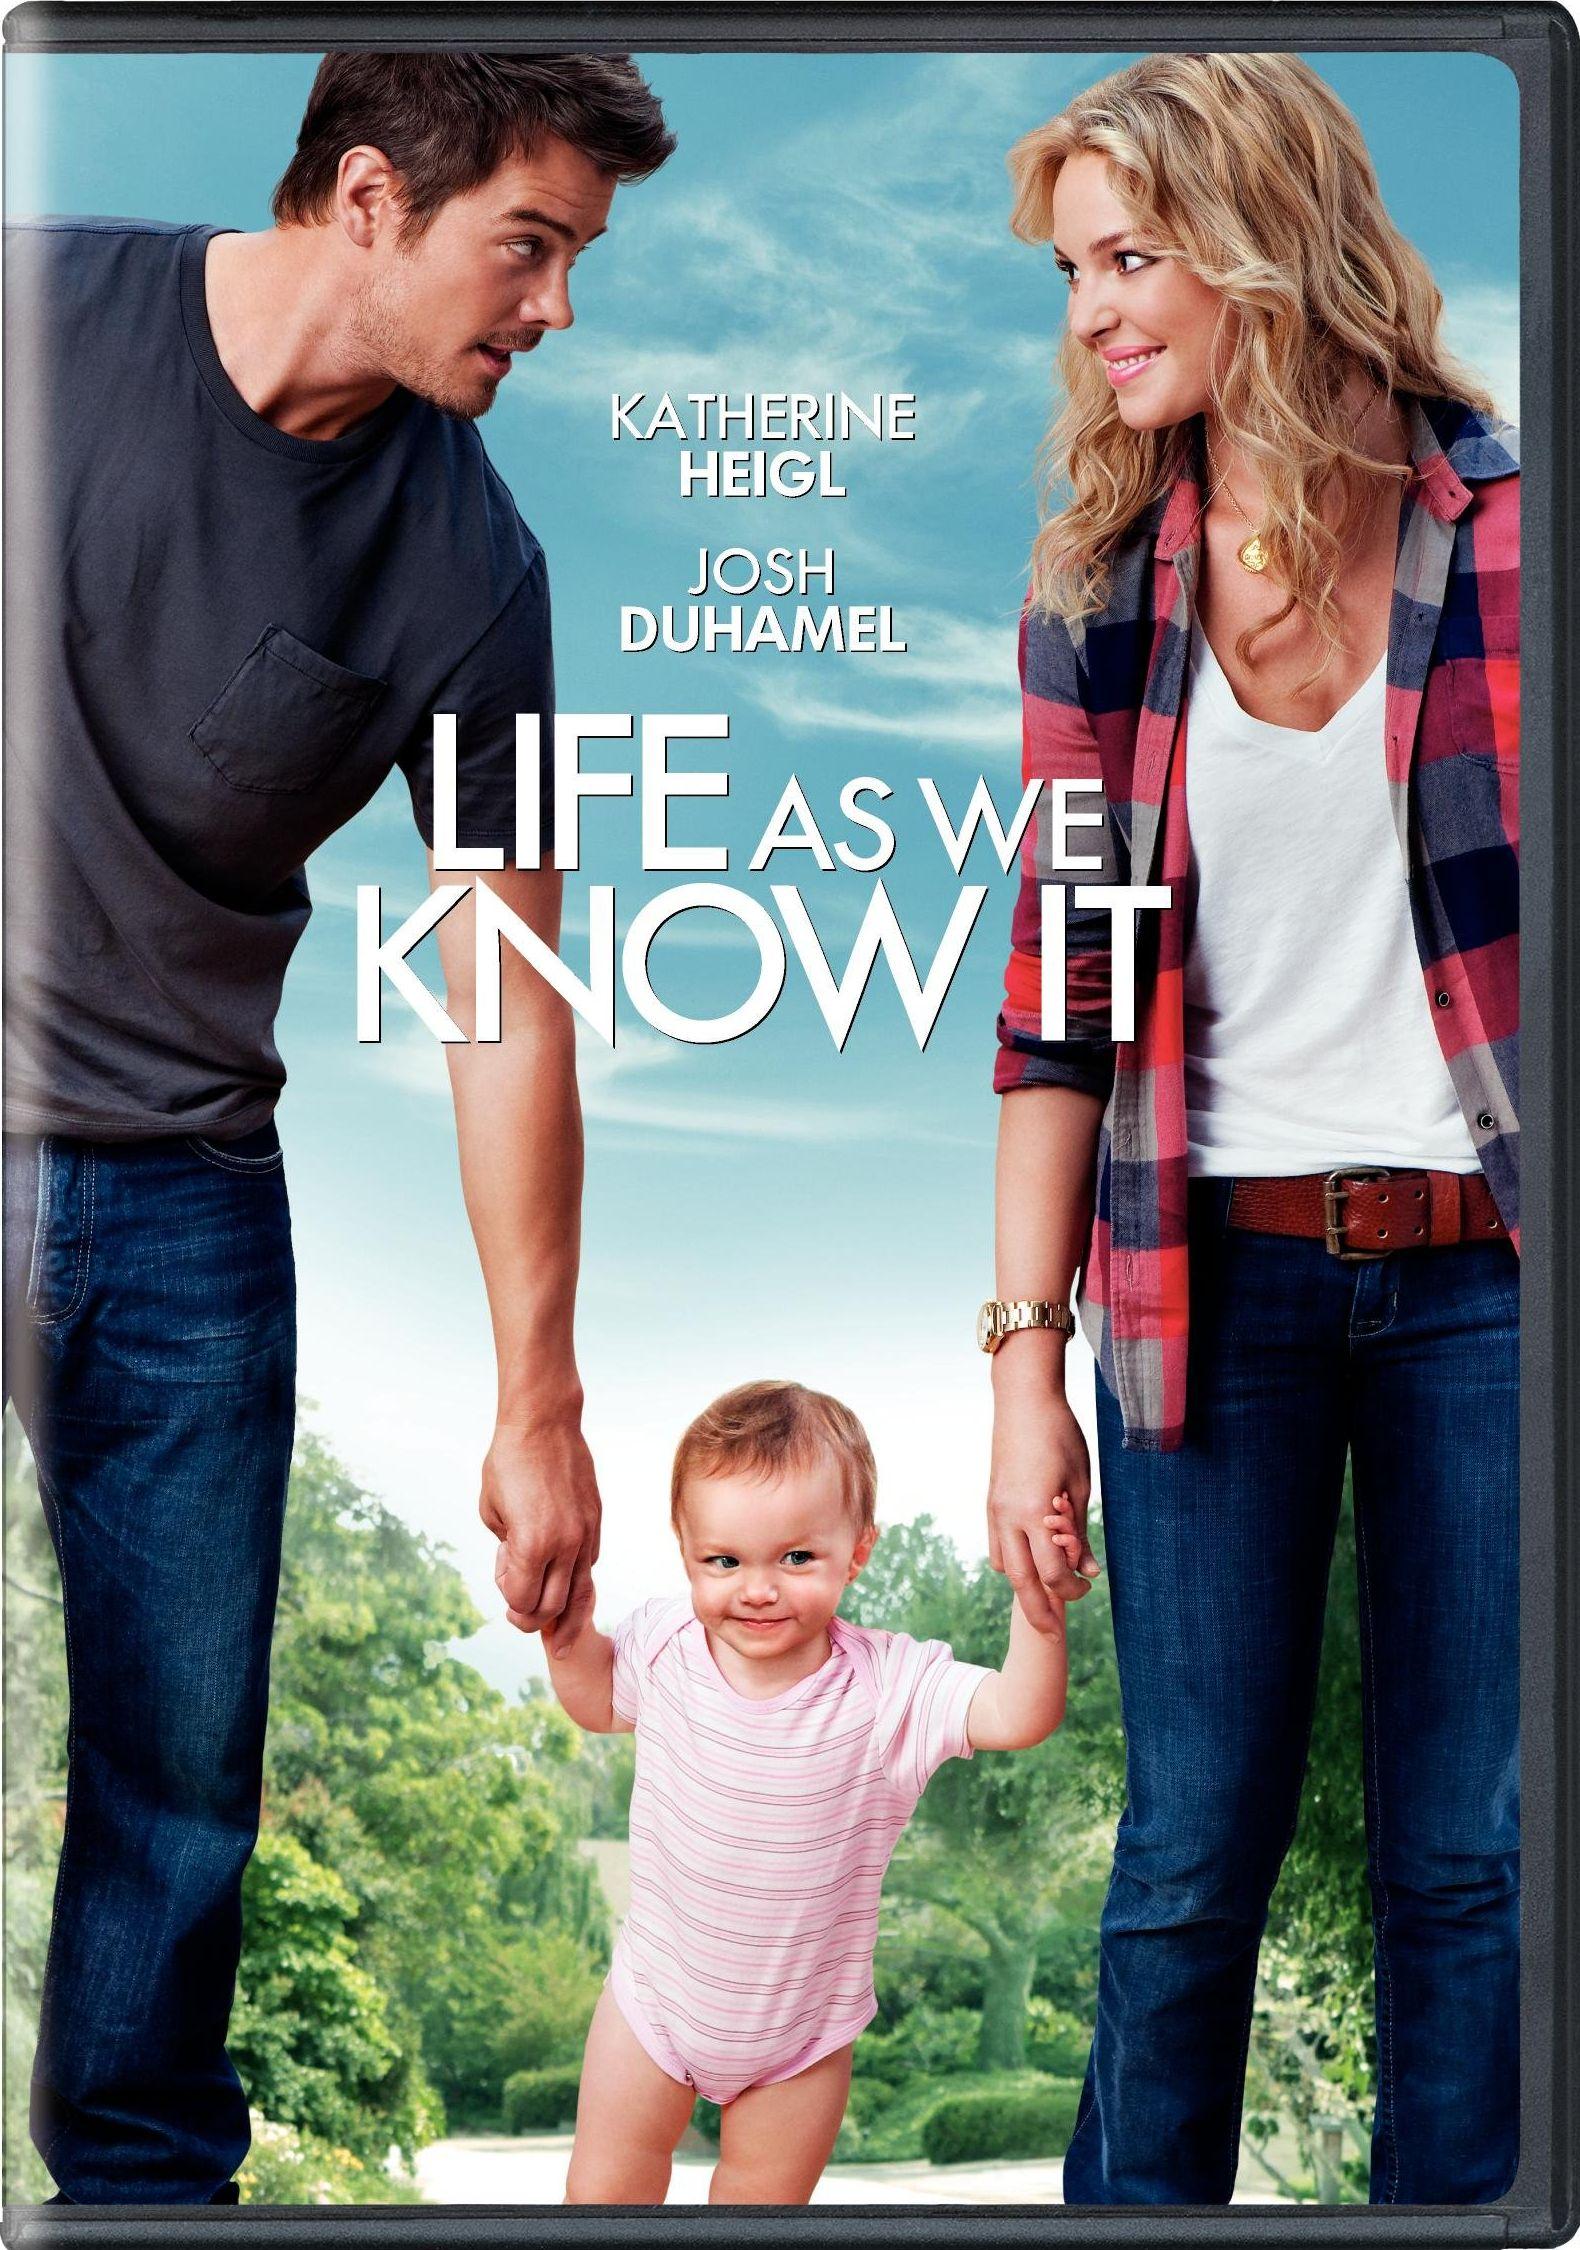 Life As We Know It / ცხოვრება ისეთია,როგორადაც ვიცნობ ჩვენ 261d9b99a5e0ed936edfb4debf5f159e